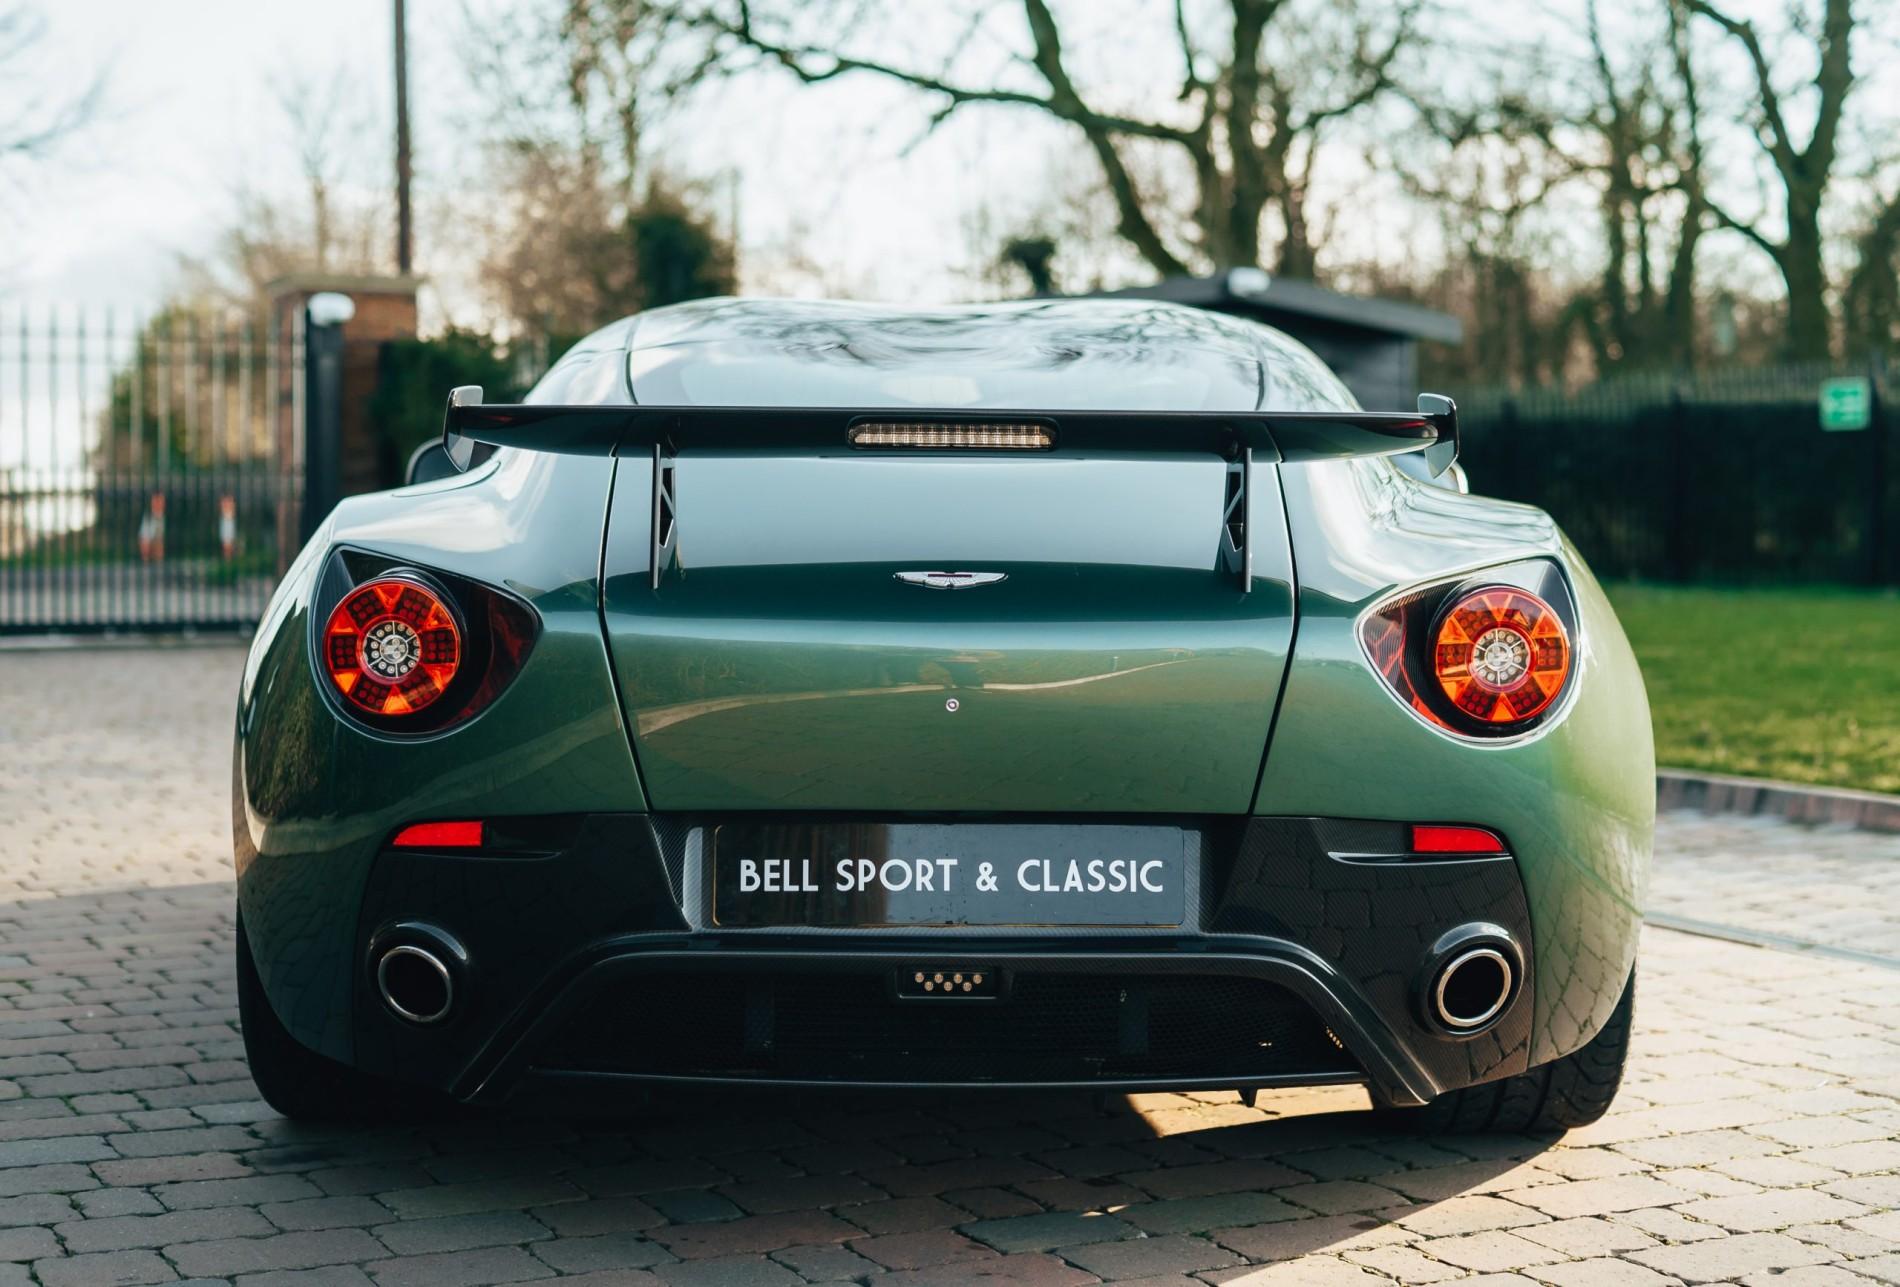 Aston Martin V12 Zagato de vanzare - Aston Martin V12 Zagato de vanzare